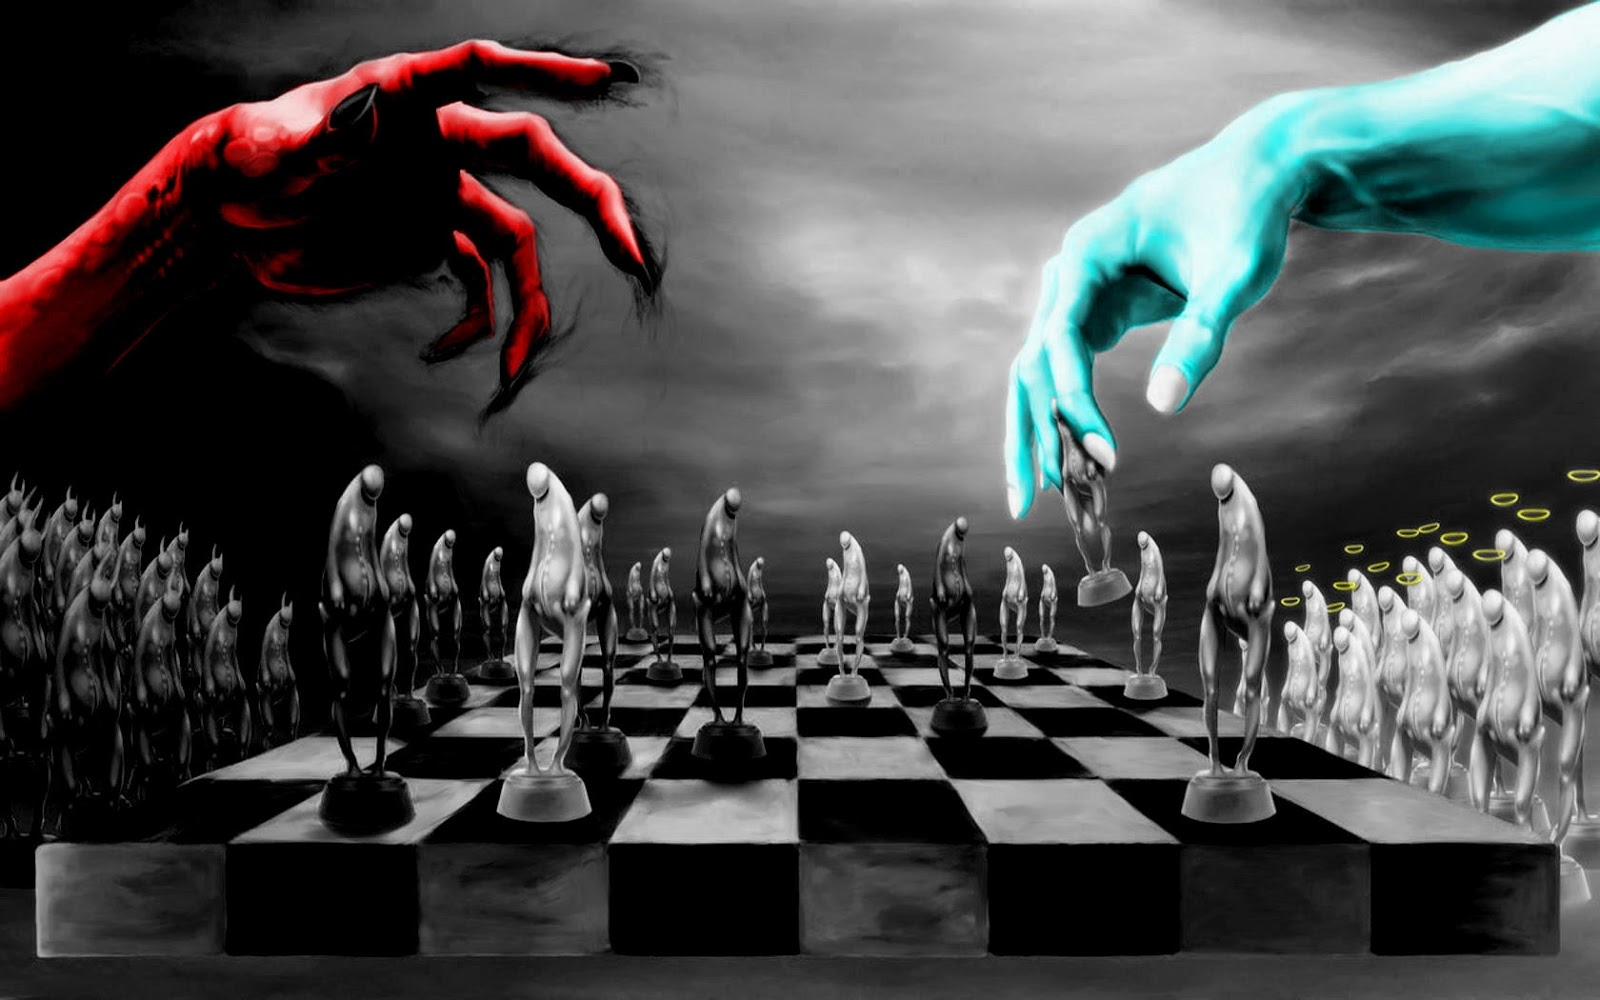 Hd wallpaper 3d chess voltagebd Gallery